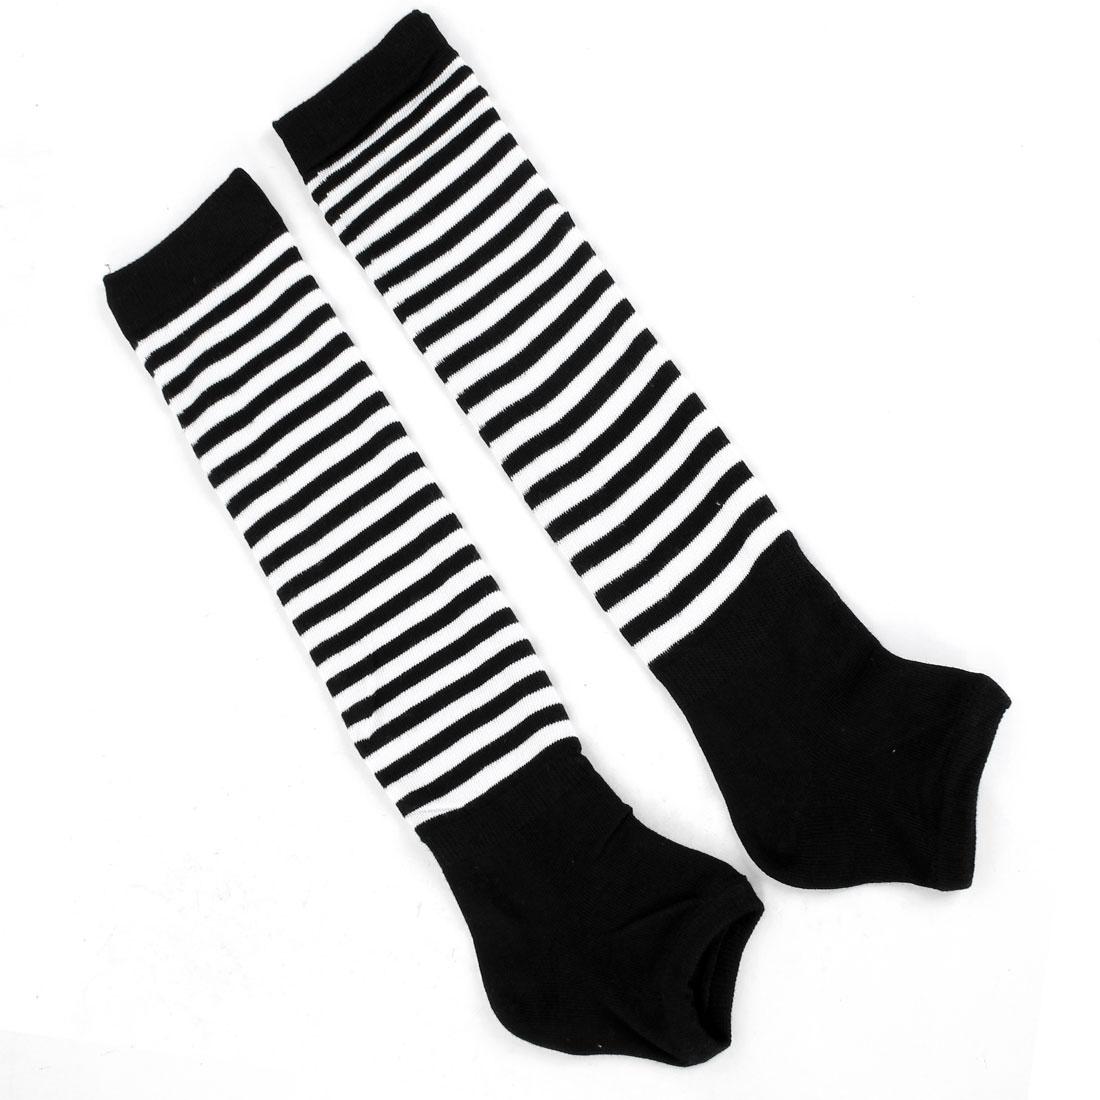 Lady Black White Stripes Pattern Toeless Knee High Leg Warmer Pair